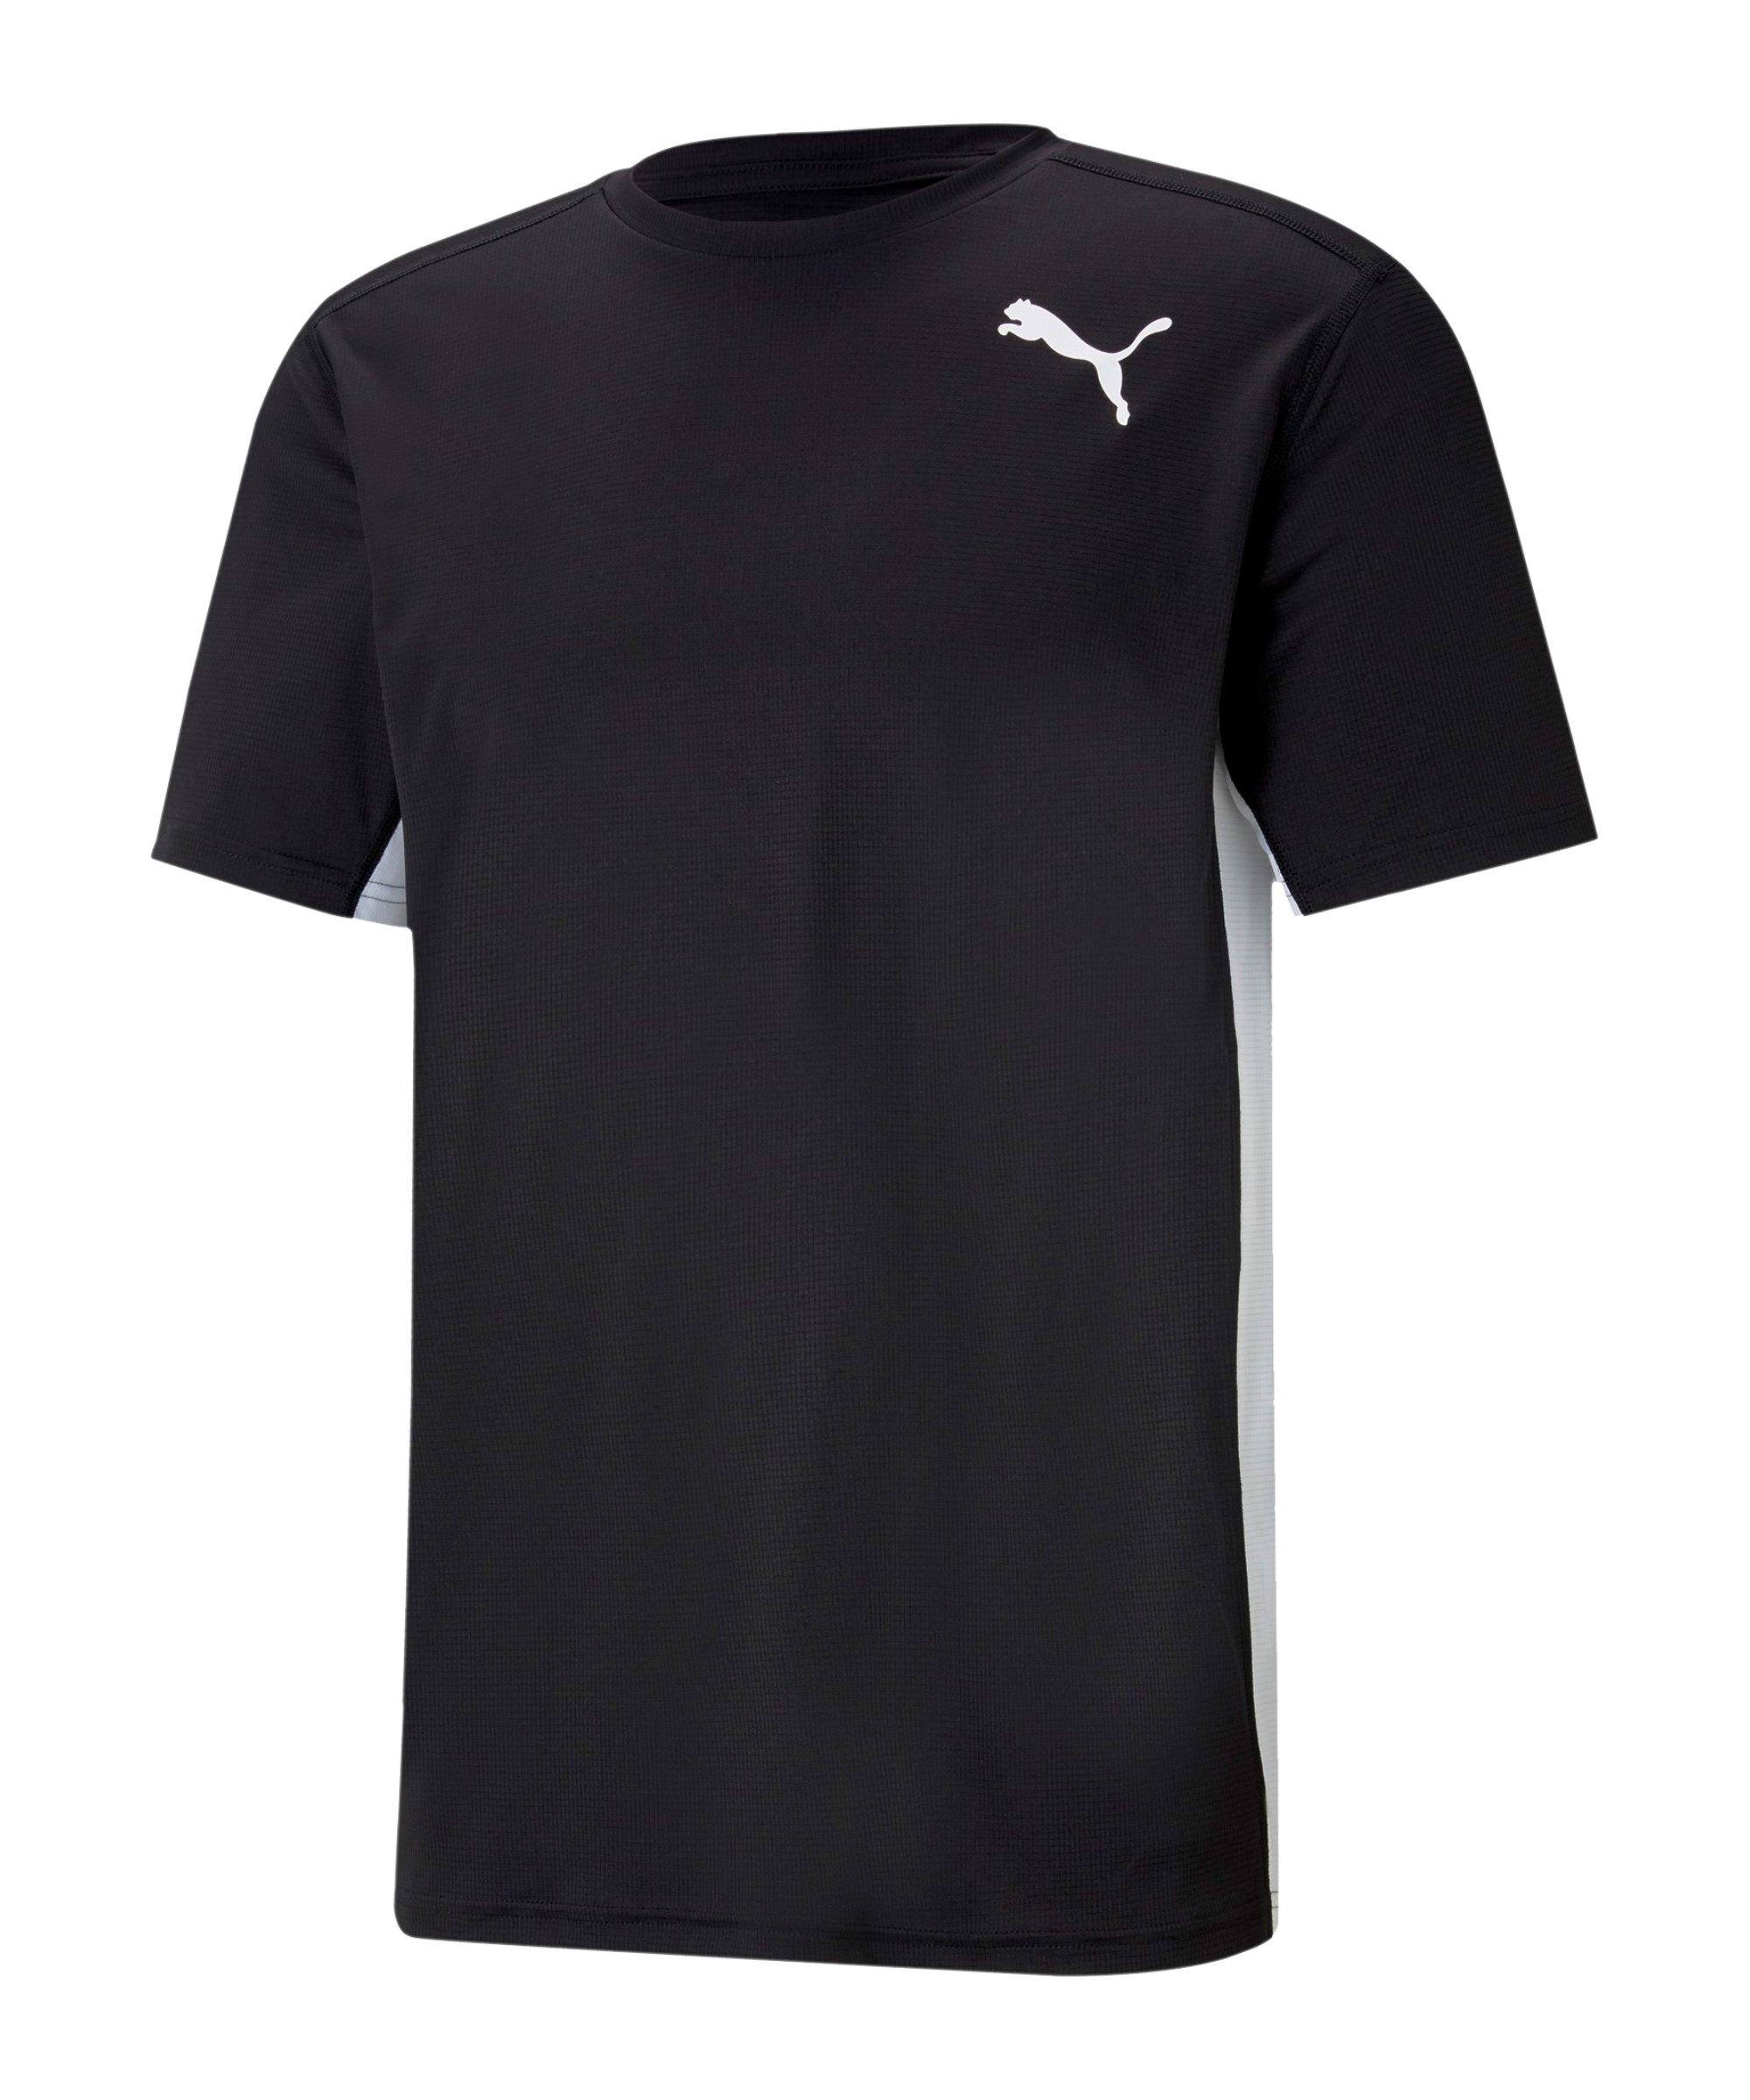 PUMA Cross the Line 2.0 T-Shirt Schwarz Weiss F01 - schwarz